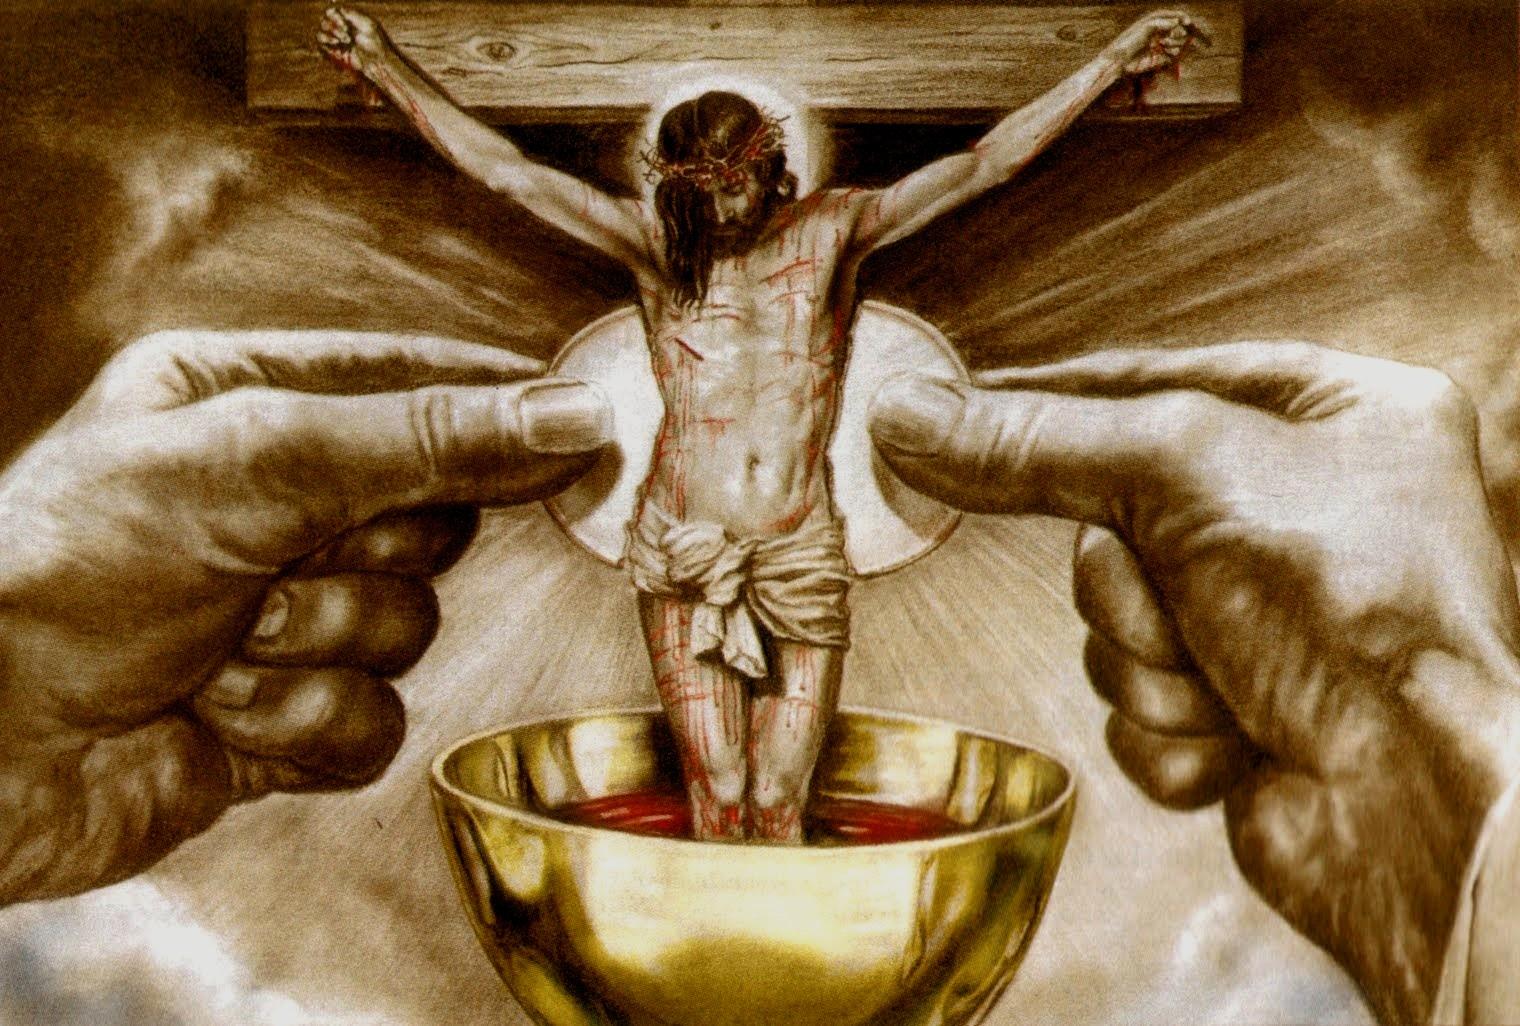 Eucharist_-_Jesus'_presence.jpg